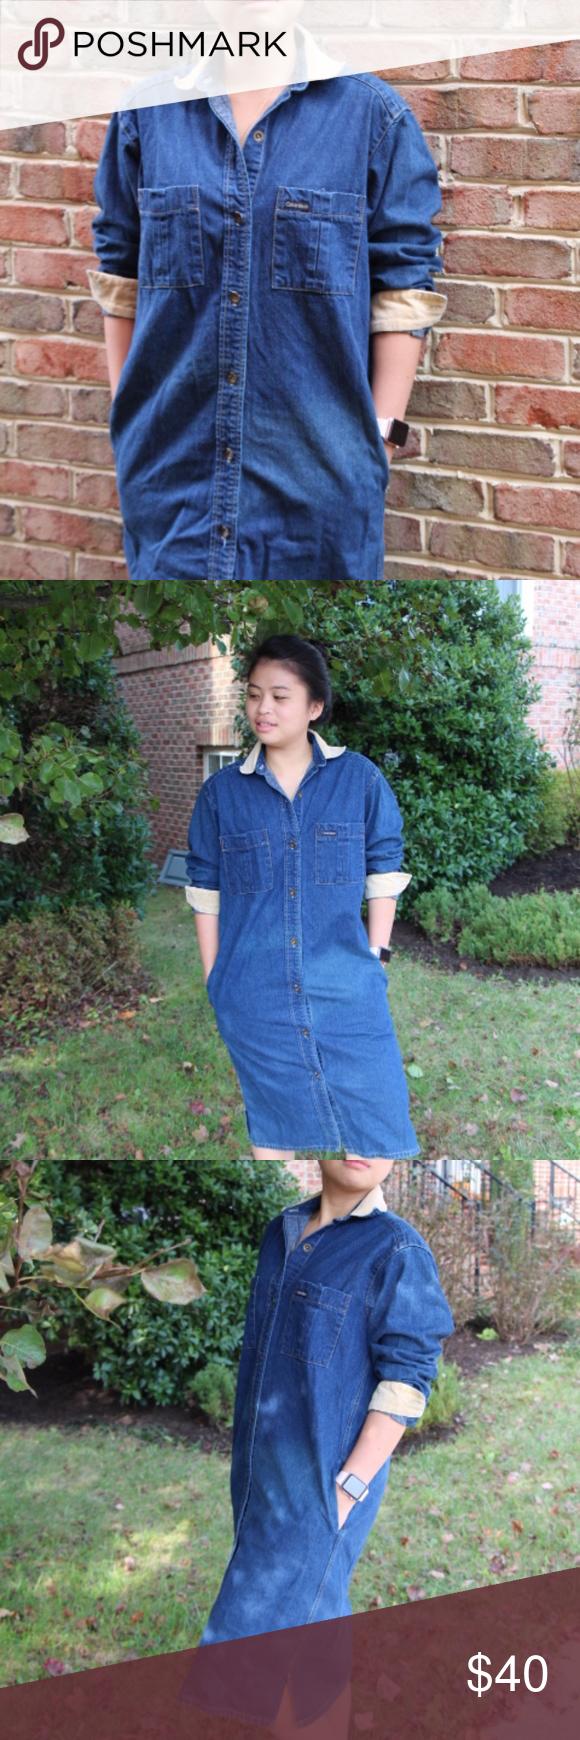 33e719b8e3f Vintage Calvin Klein Denim dress